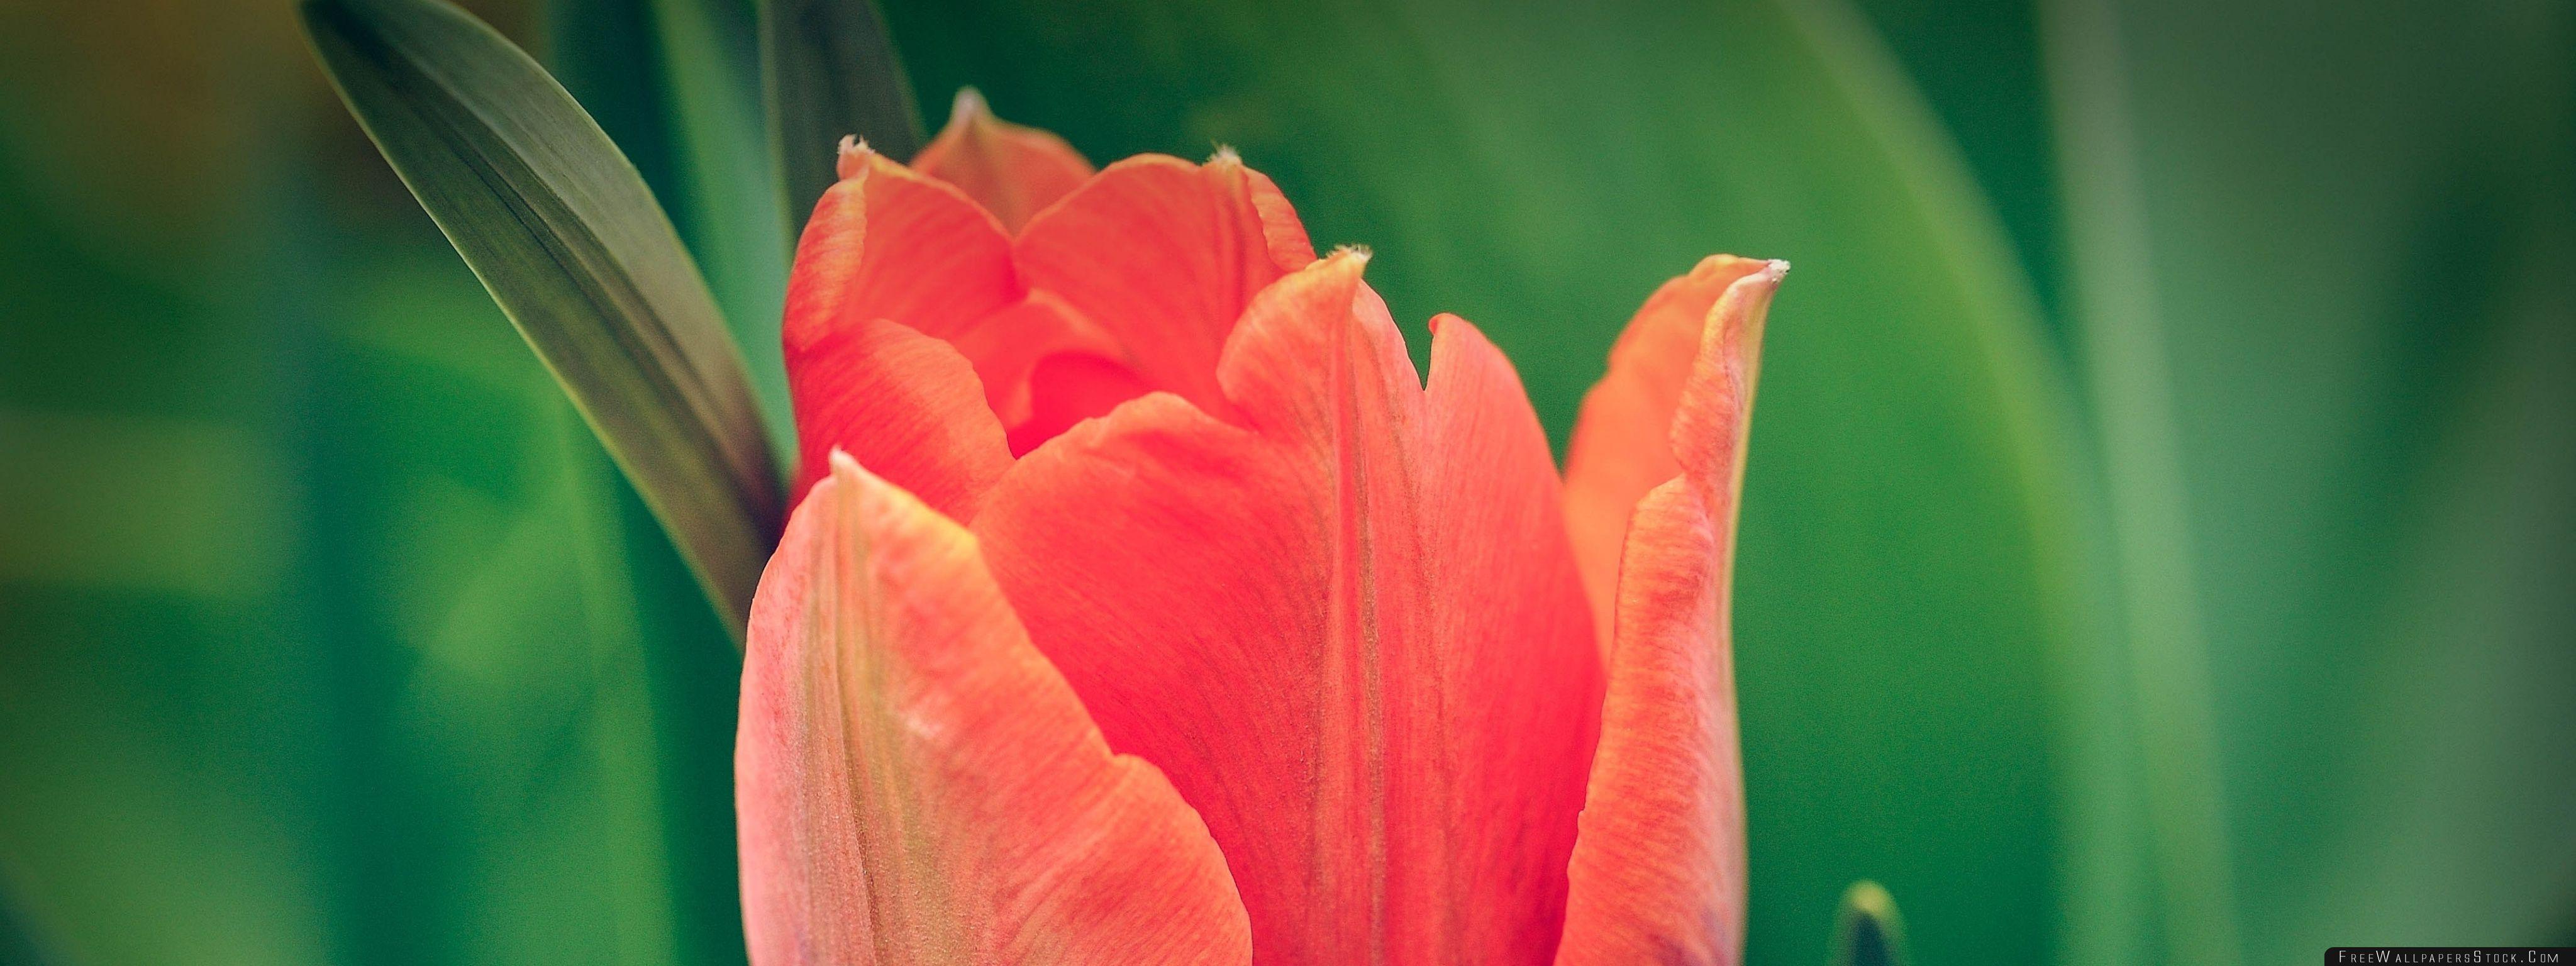 Download Free Wallpaper Tulip Green Background